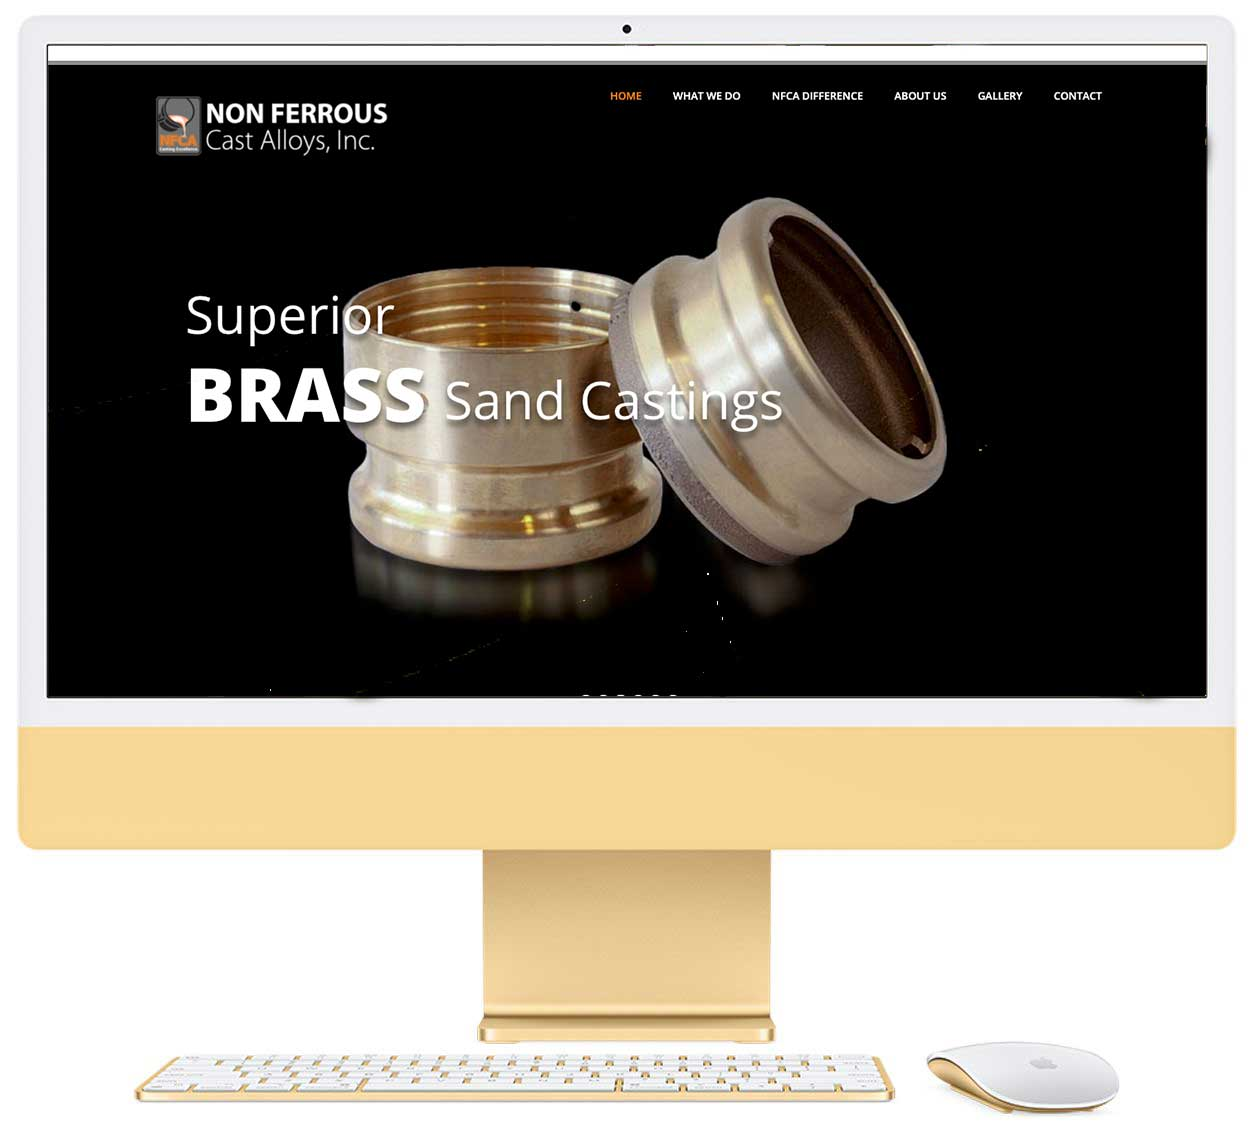 Non Ferrous Cast Alloys Website